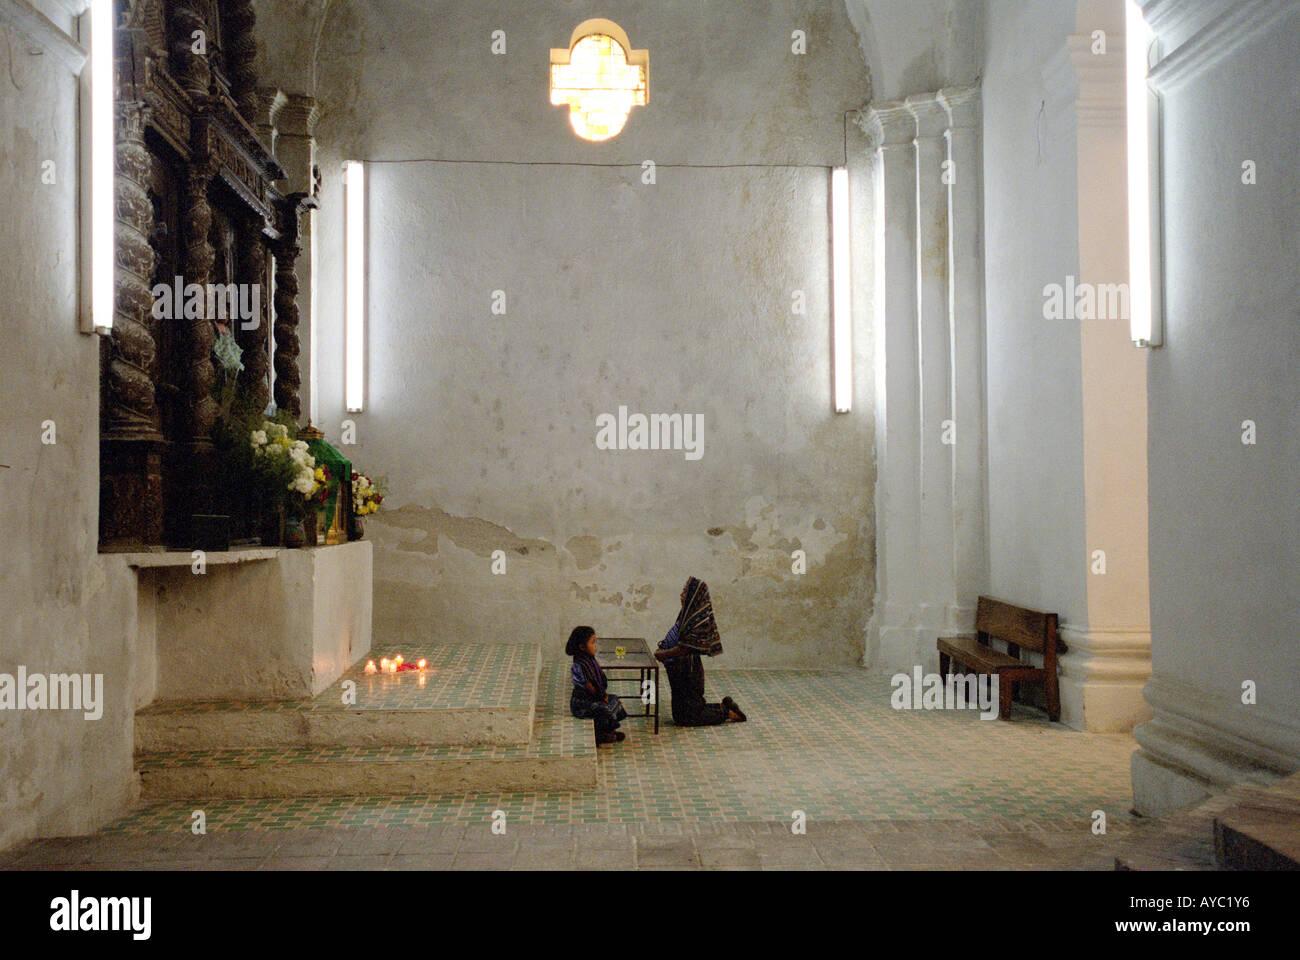 Woman and Child at Prayer, Church Interior, Santiago, Lake Atitlan, Guatemala - Stock Image